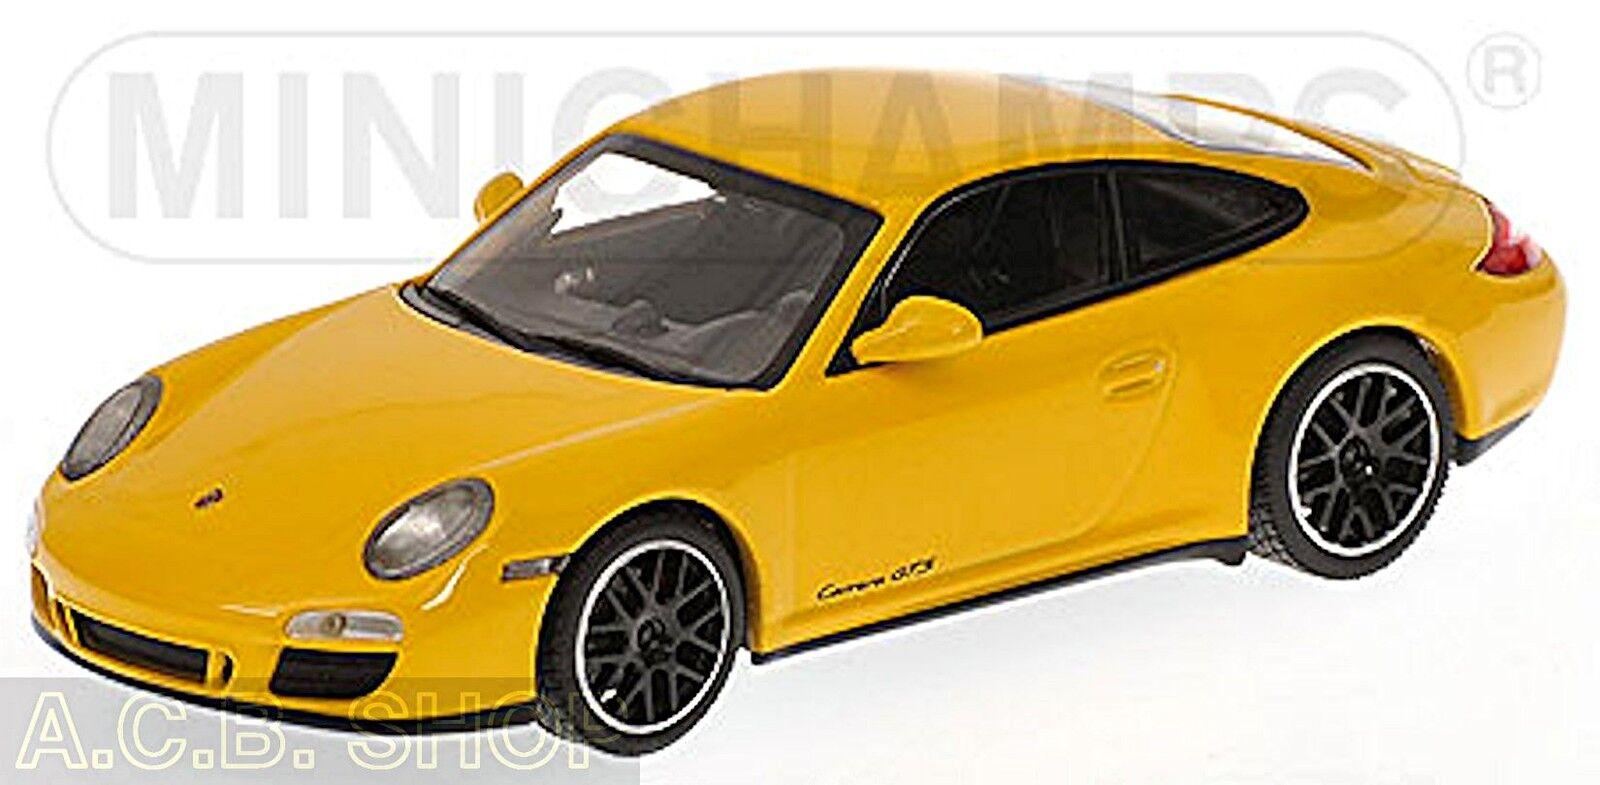 Porsche 911 GTS 997 II 2011 yellow 1 43 Minichamps